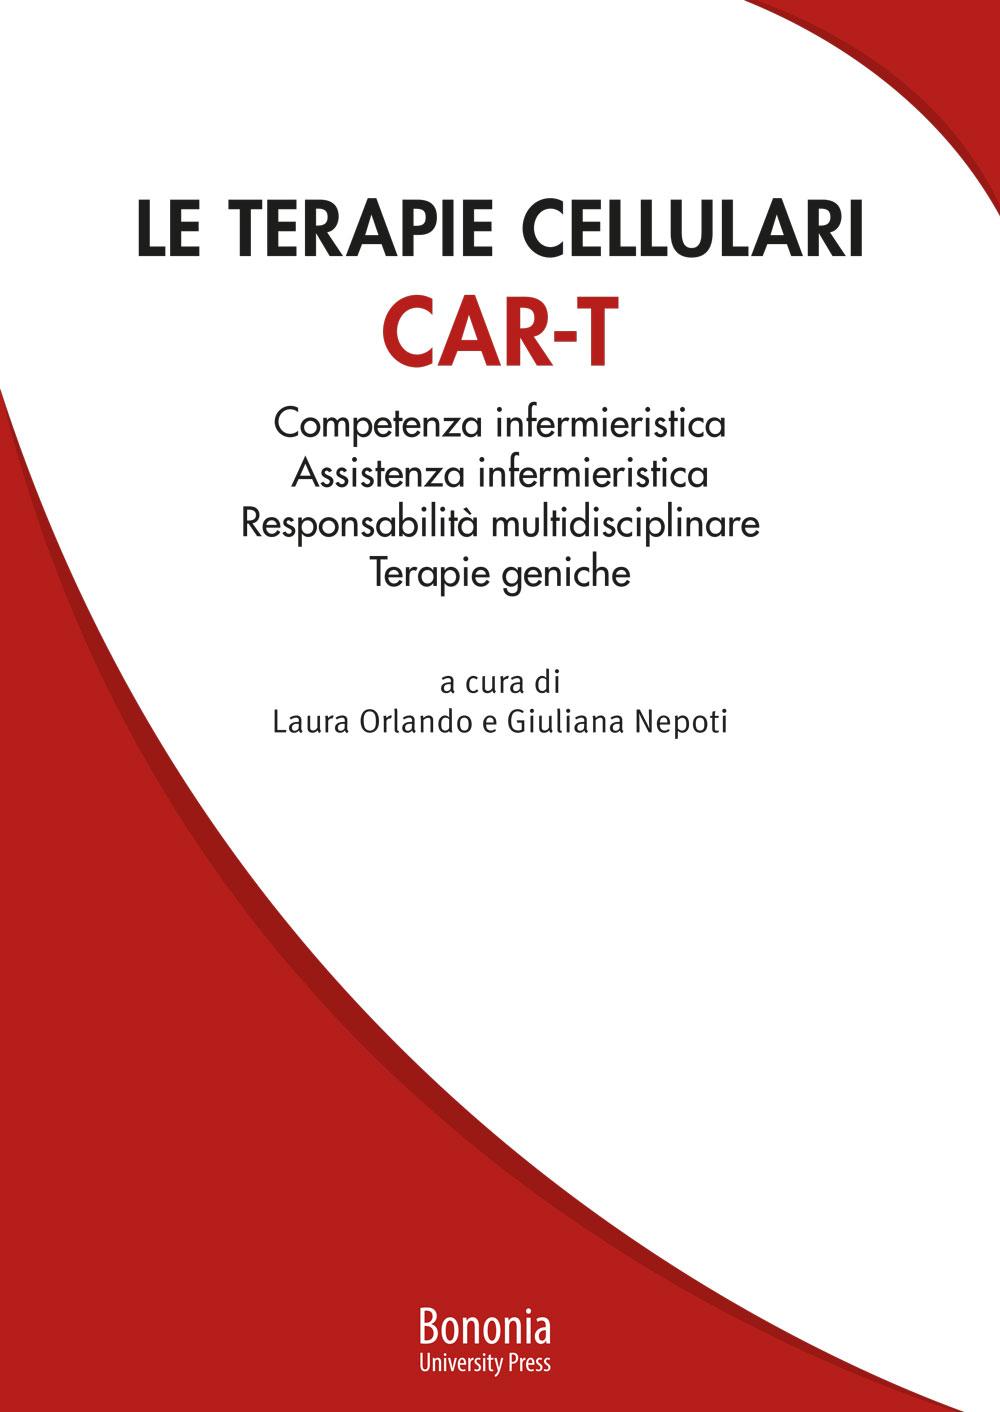 Le terapie cellulari CAR-T - Bononia University Press